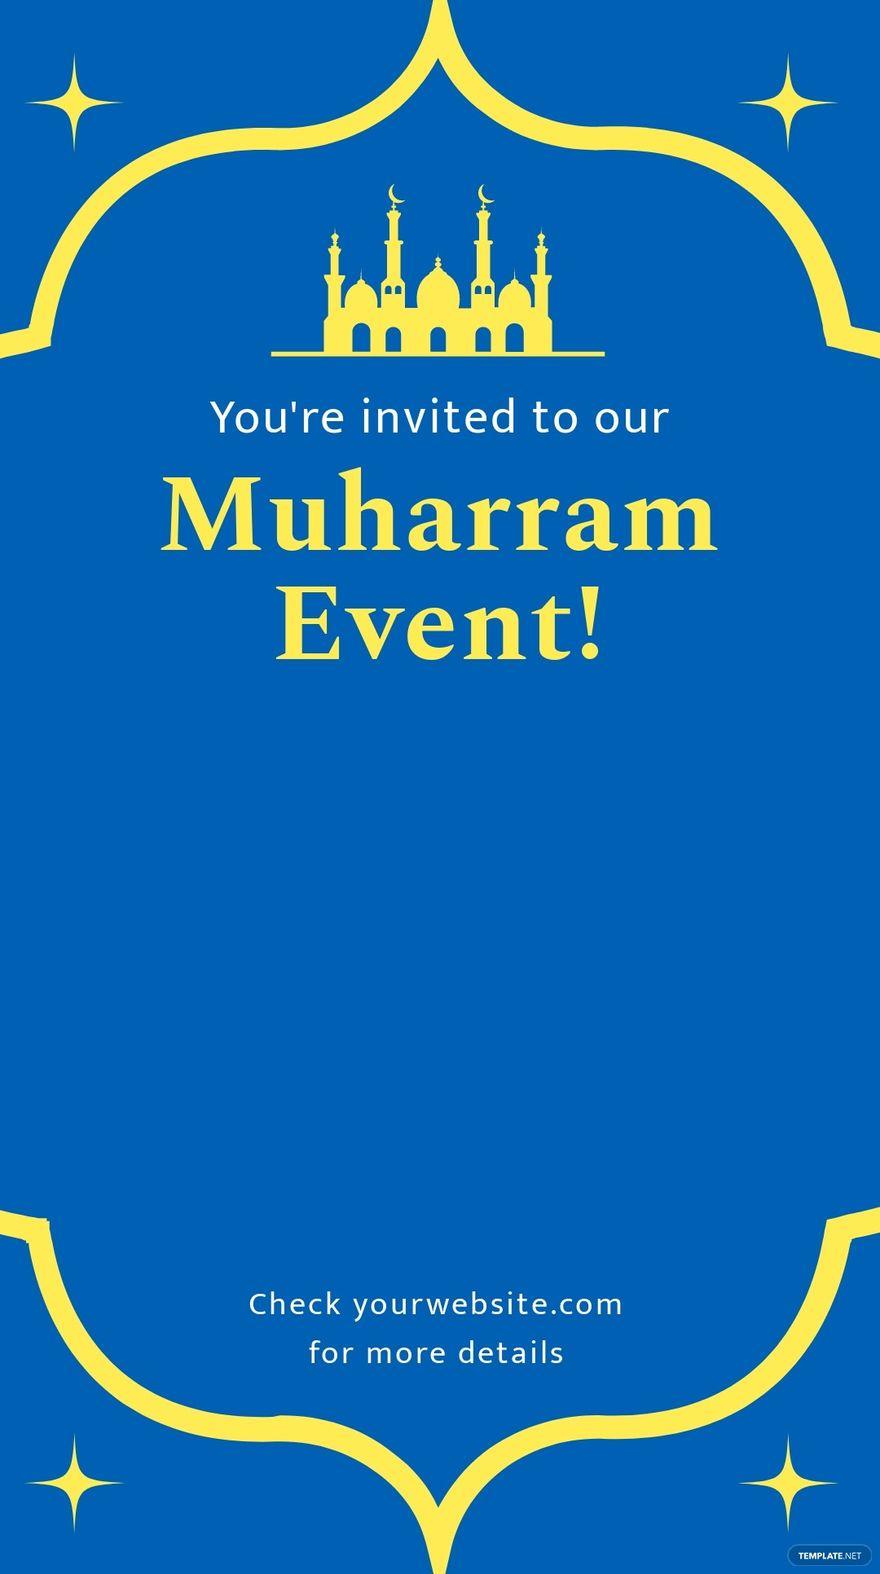 Muharram Invitation Snapchat Geofilter Template.jpe